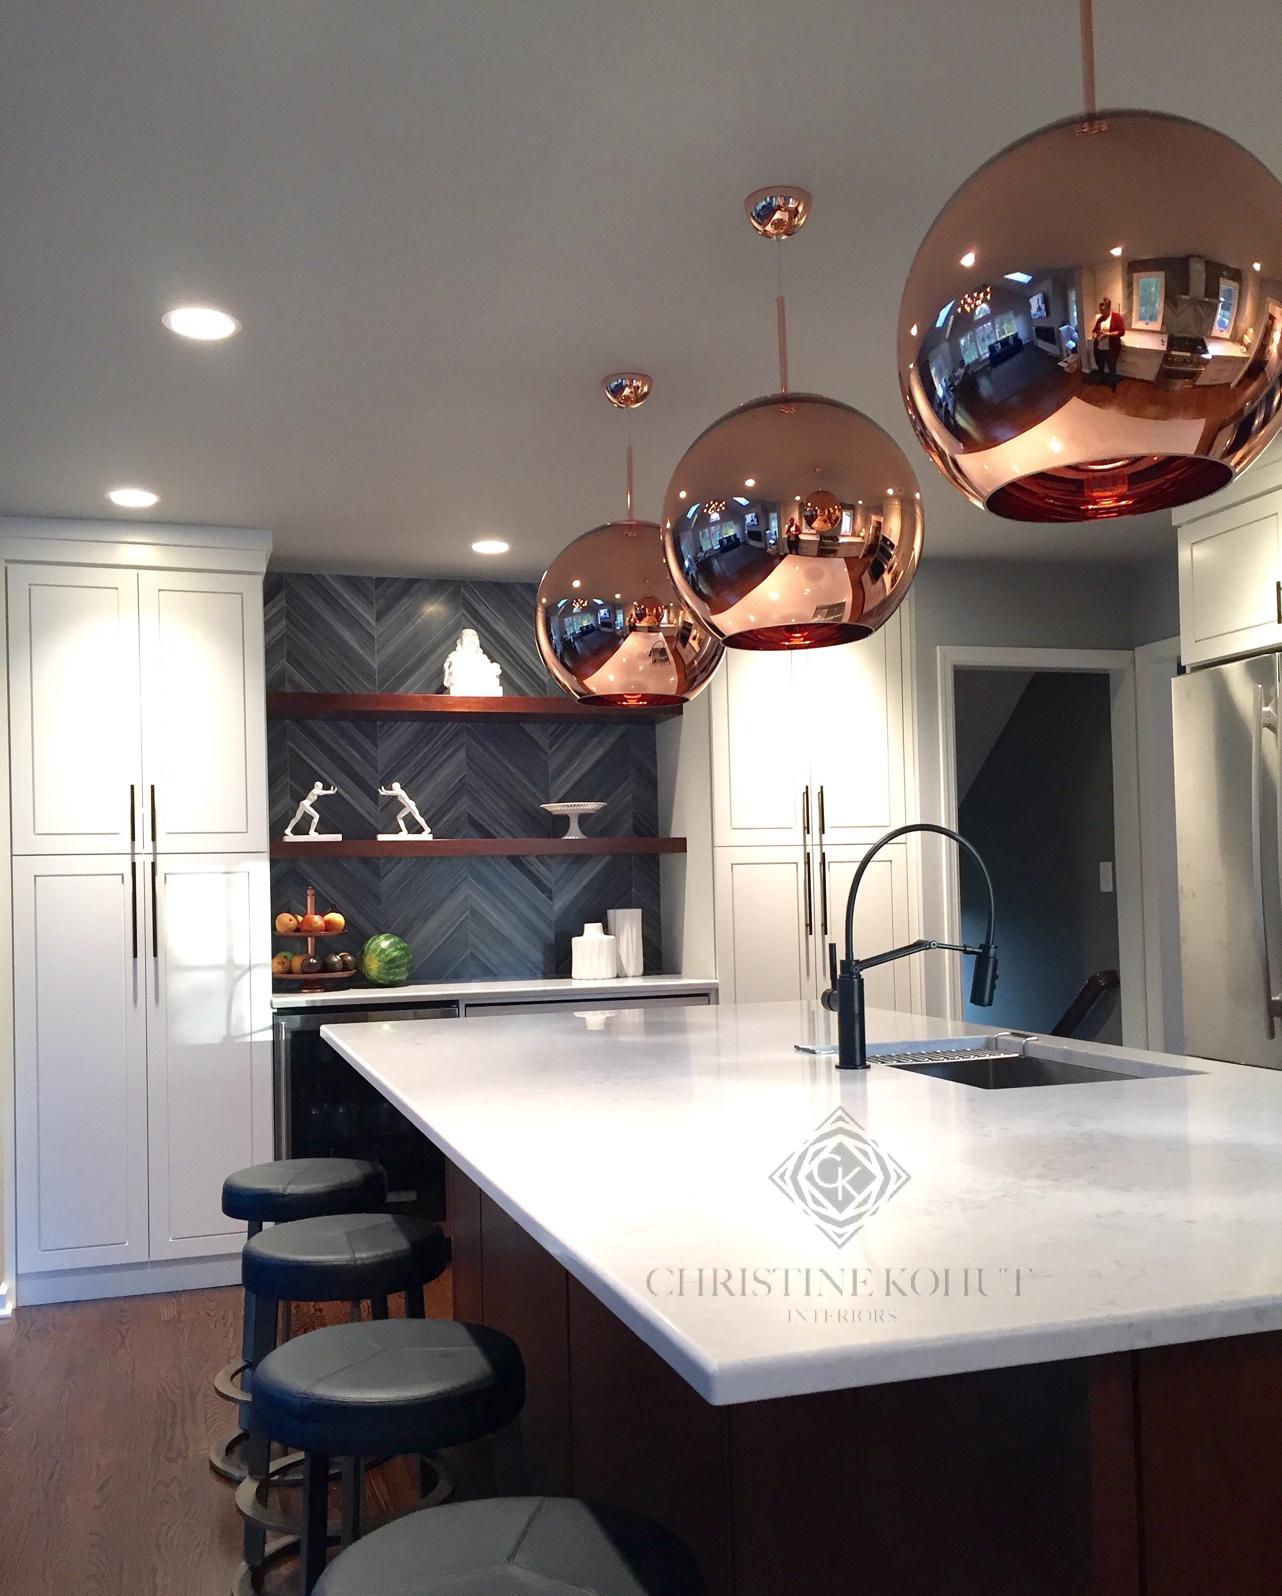 Christine Kohut Interiors Rose Gold Quartz Counters Marble Chevron Backsplash Interior Design Kitc Rose Gold Kitchen Kitchen Design Decor Gold Dining Room